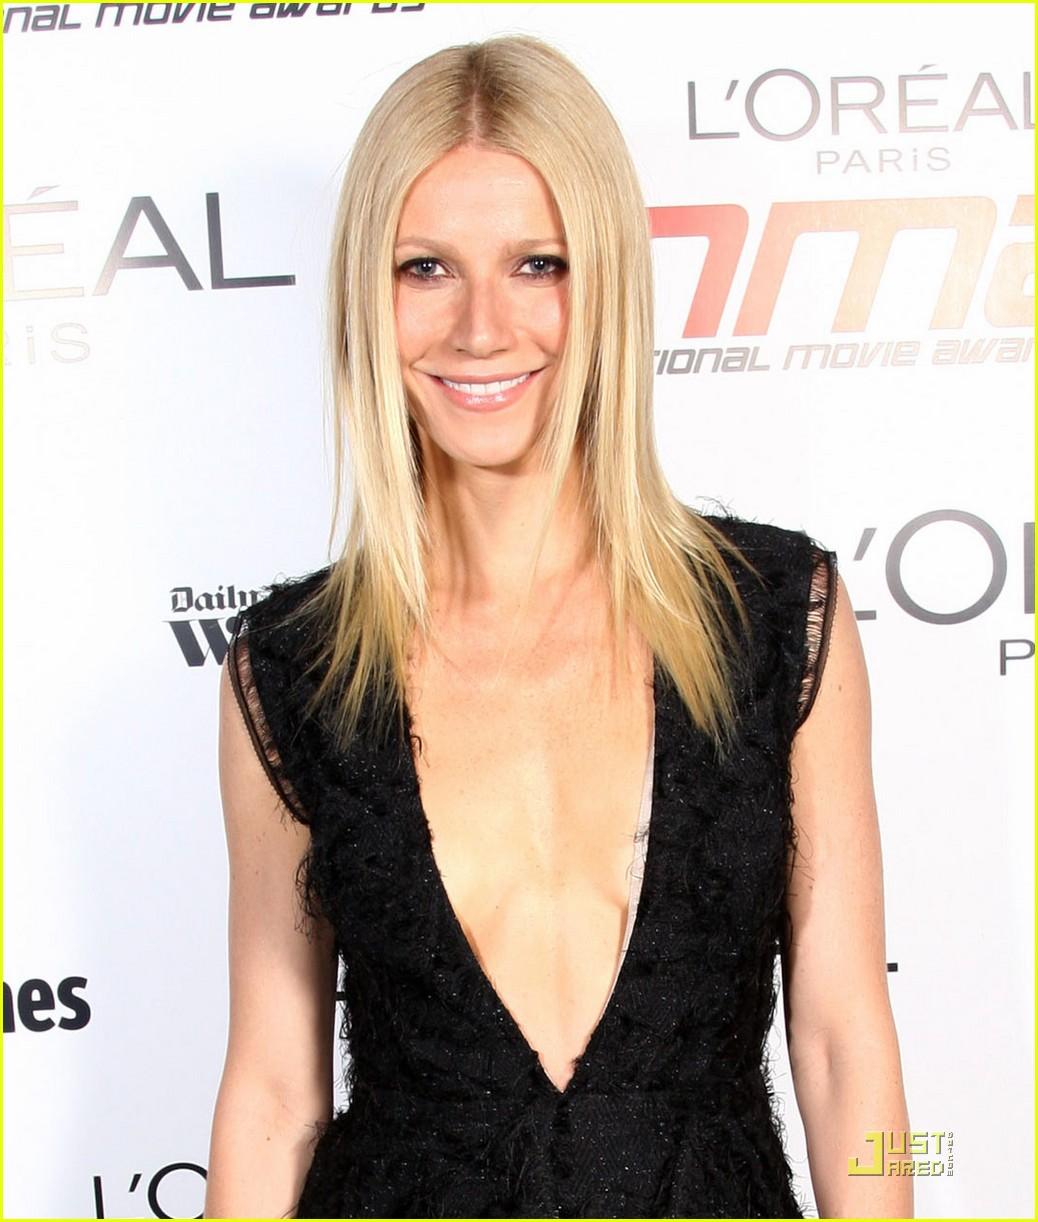 http://2.bp.blogspot.com/-Q2uQl8NjhNE/TdaMEDgghjI/AAAAAAAANHg/tMad1Ff-3Gc/s1600/gwyneth-paltrow-national-movie-awards-in-london-04.jpg